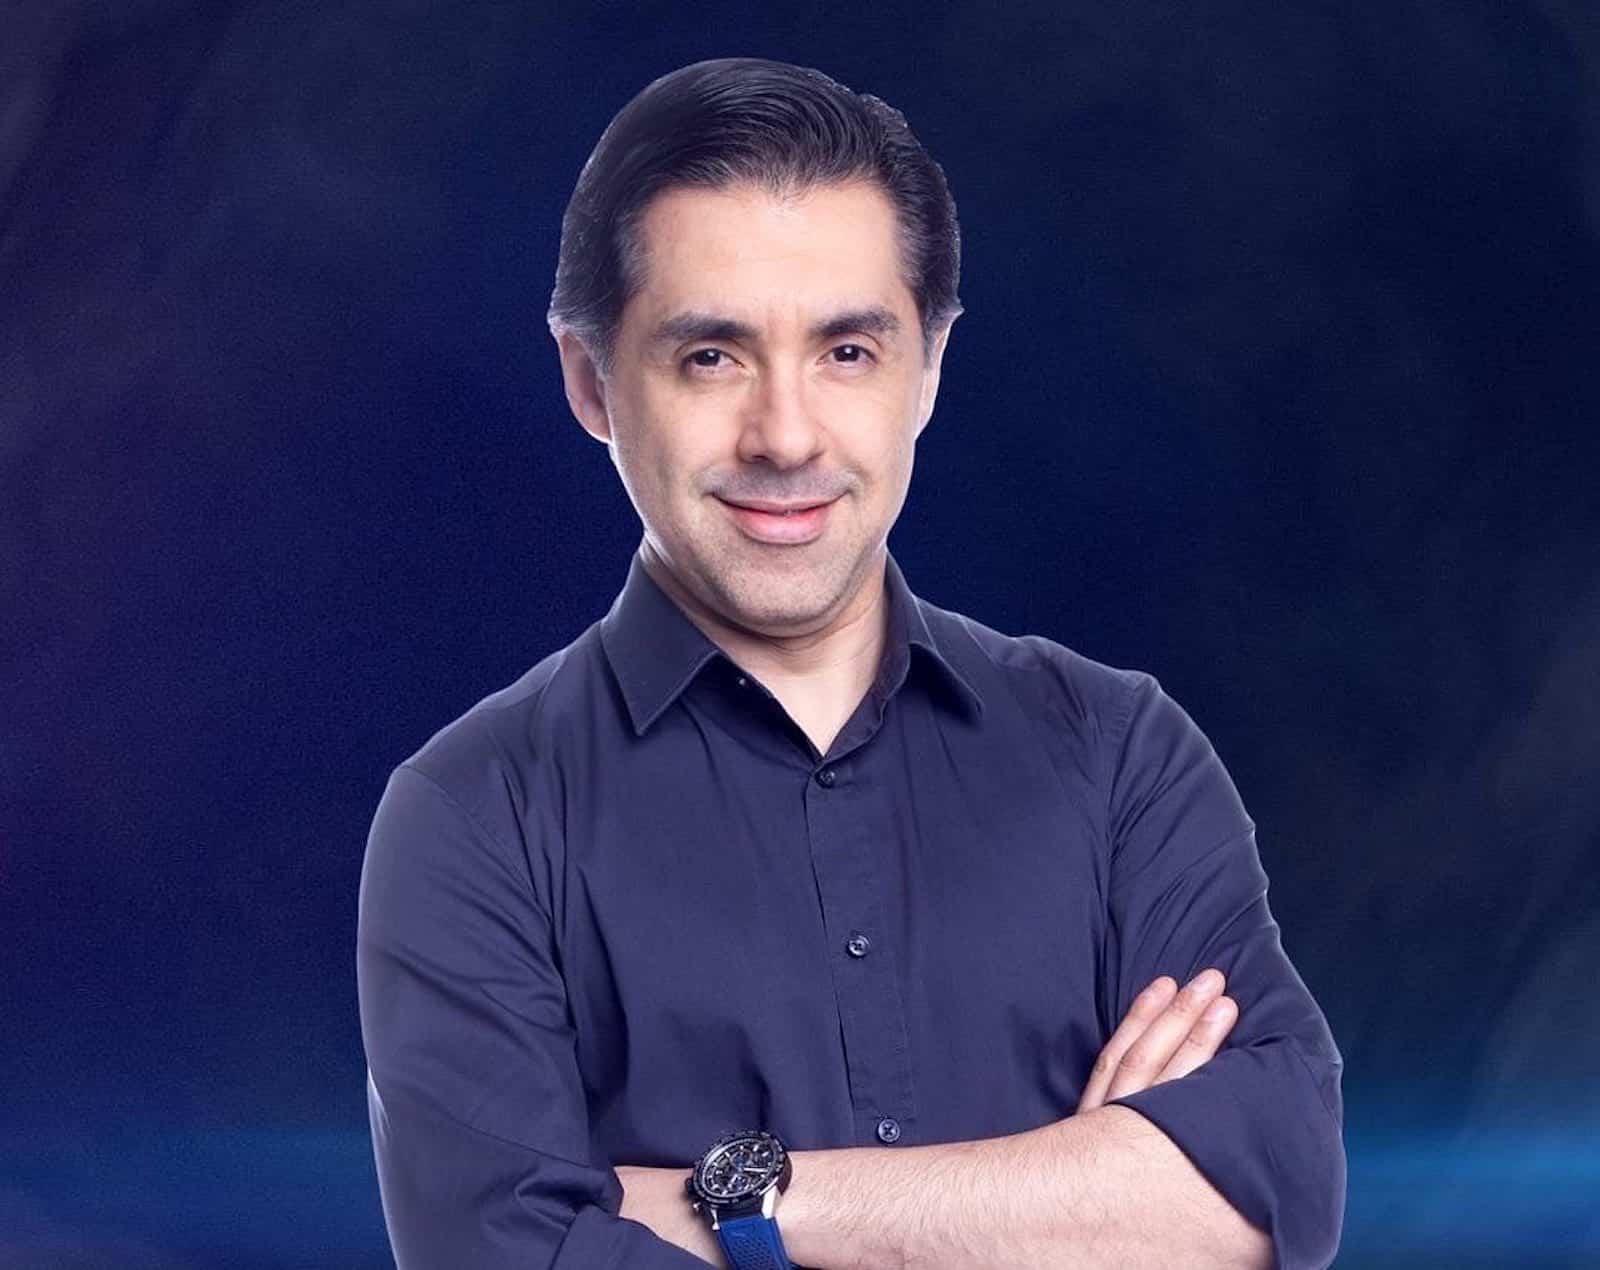 Pedro Soa